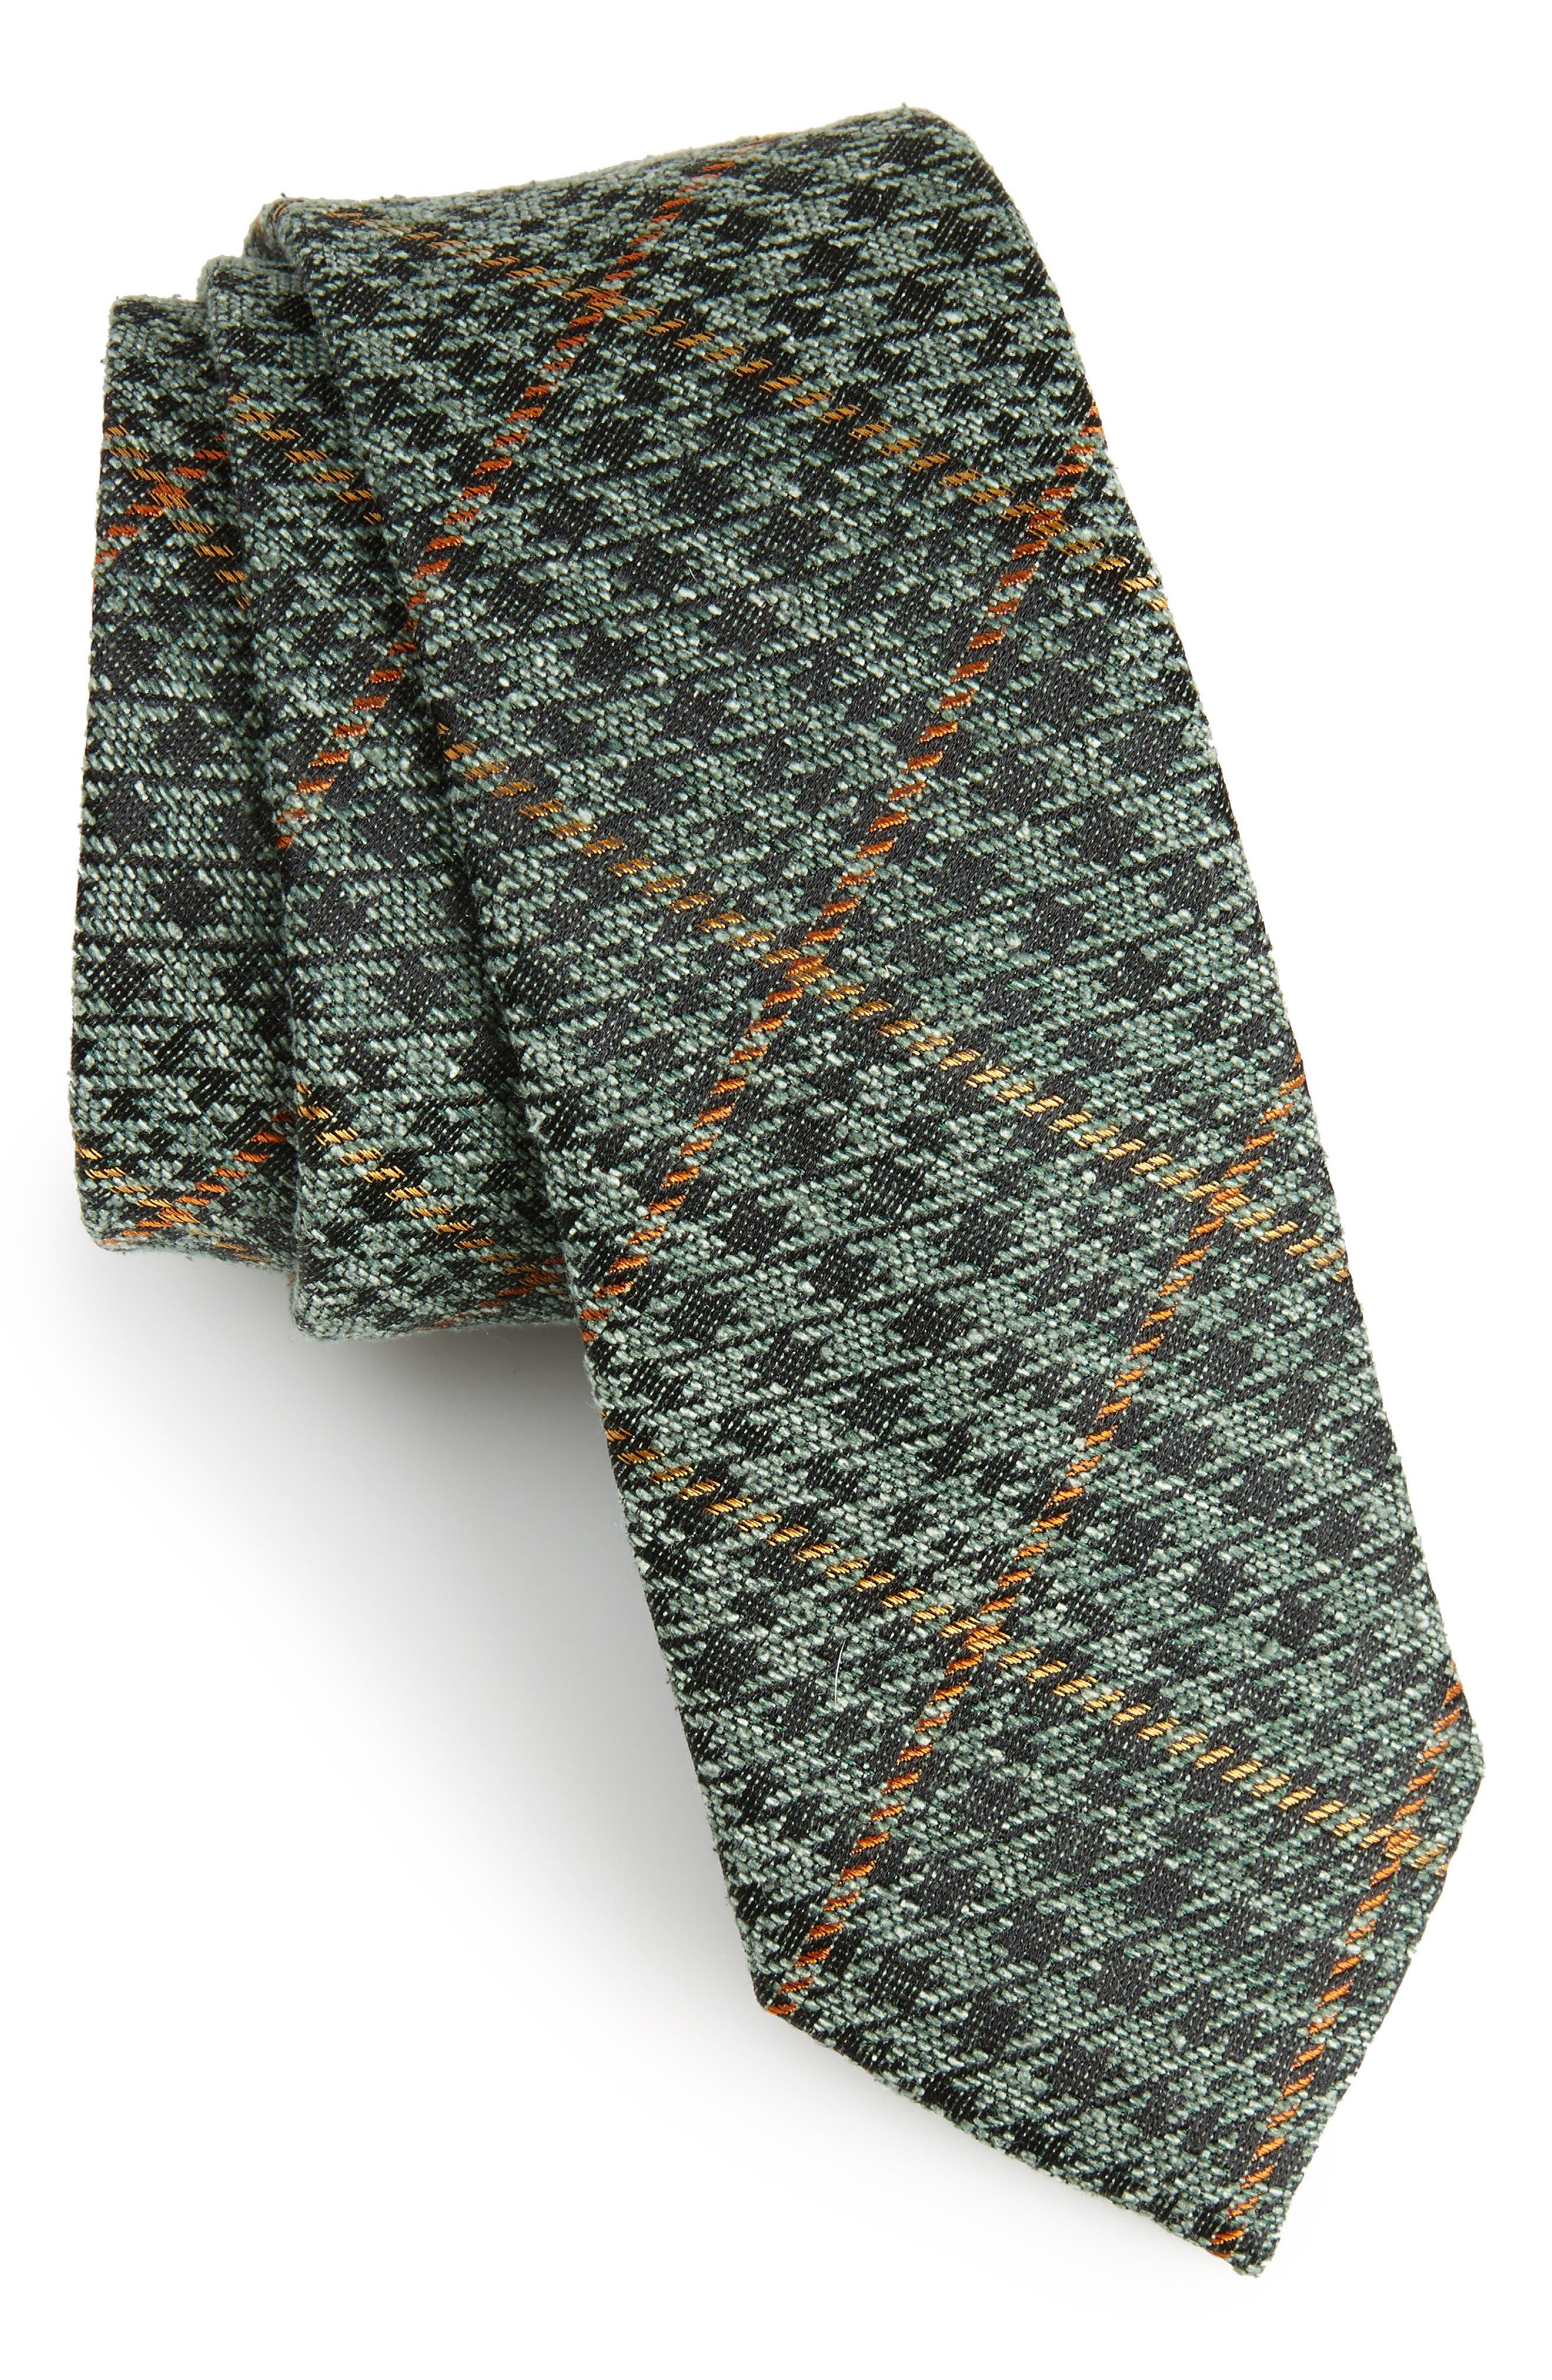 Alternate Image 1 Selected - The Tie Bar Quinn Plaid Silk Skinny Tie